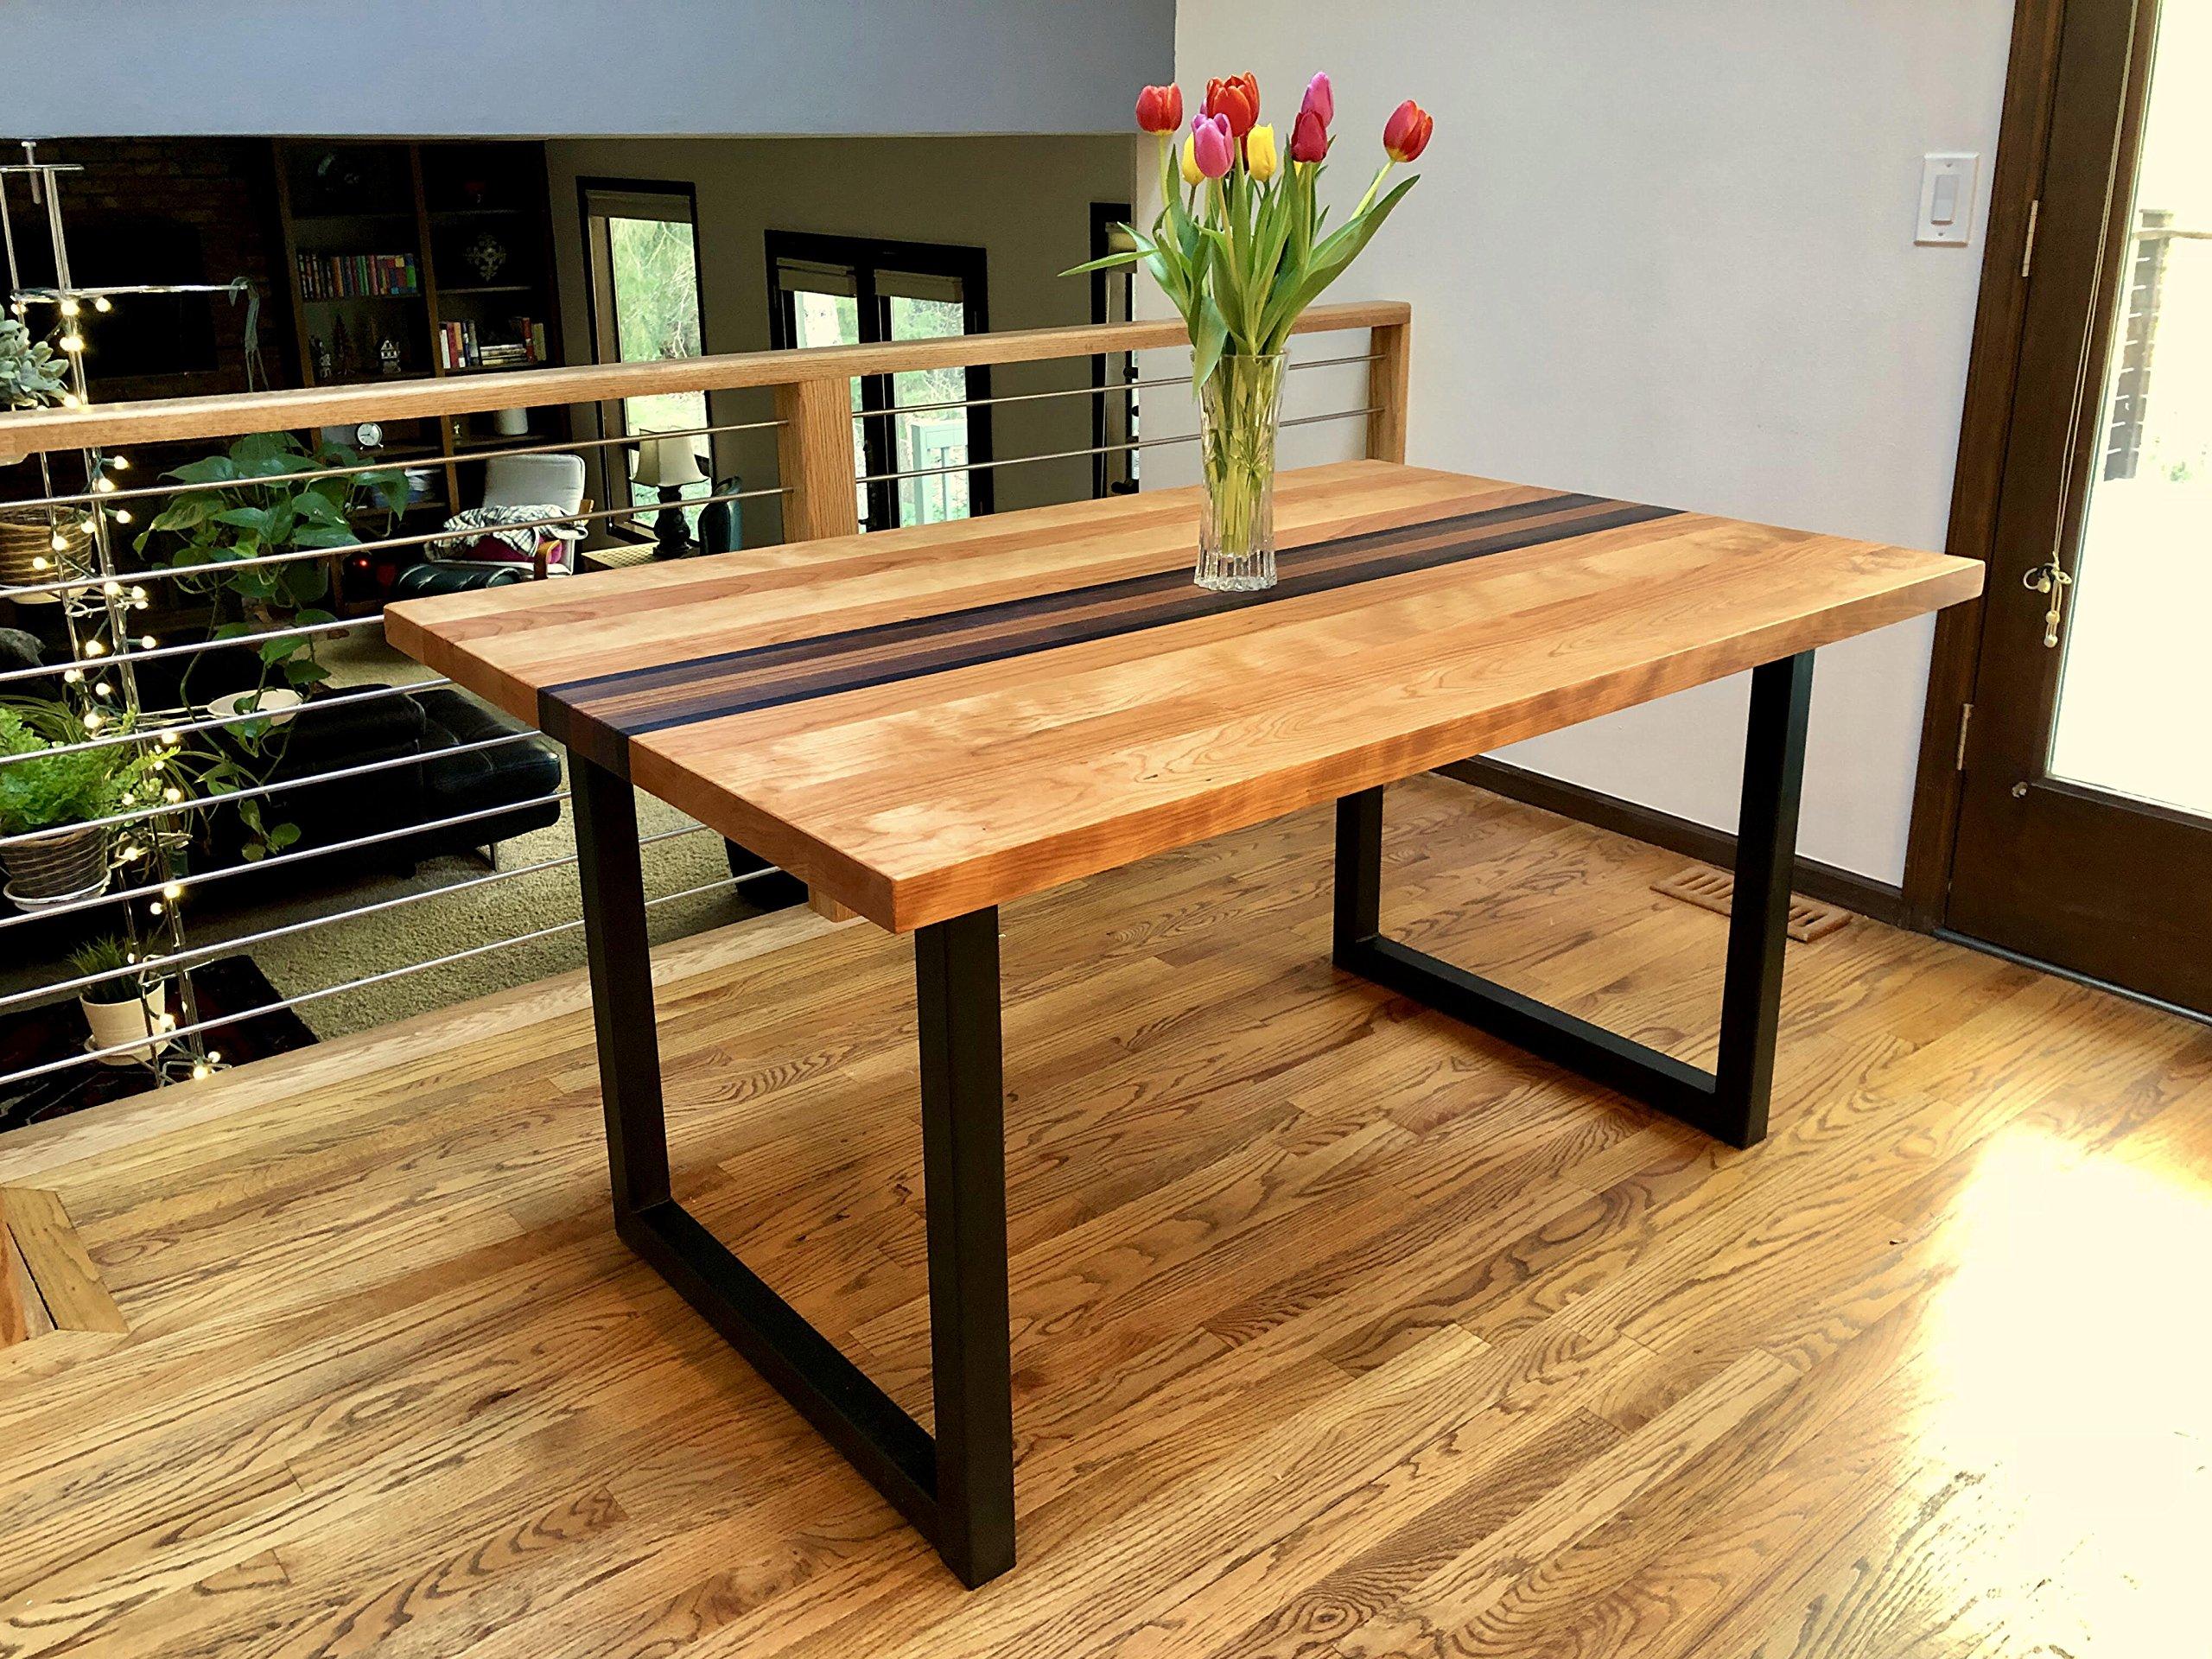 Metal Table Legs - U Frame -  - kitchen-dining-room-furniture, kitchen-dining-room, kitchen-dining-room-tables - 91anuBa%2BiYL -